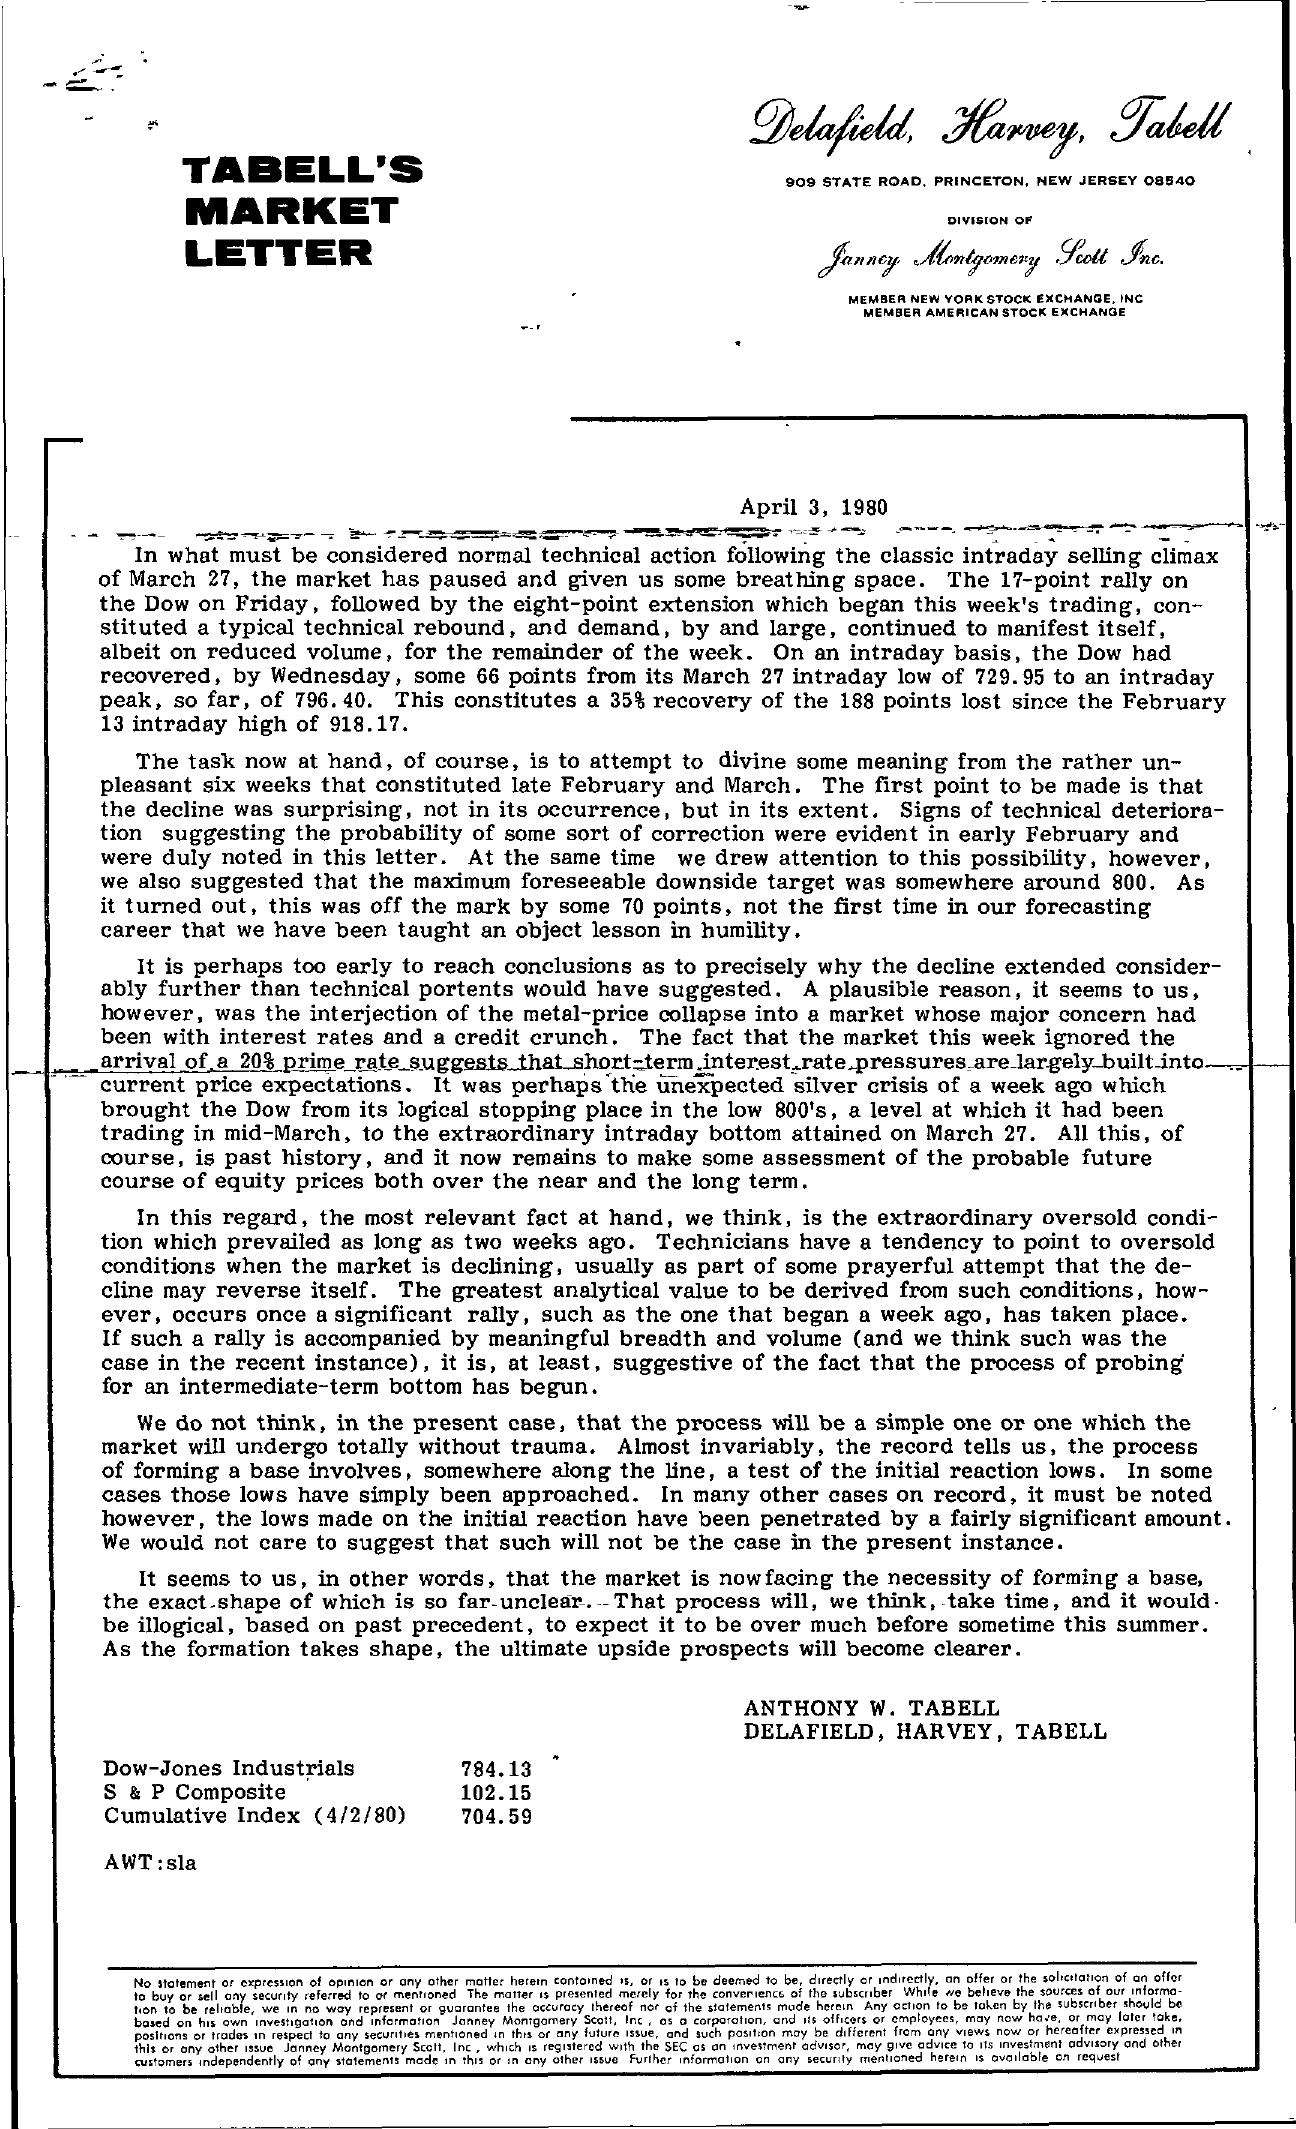 Tabell's Market Letter - April 03, 1980